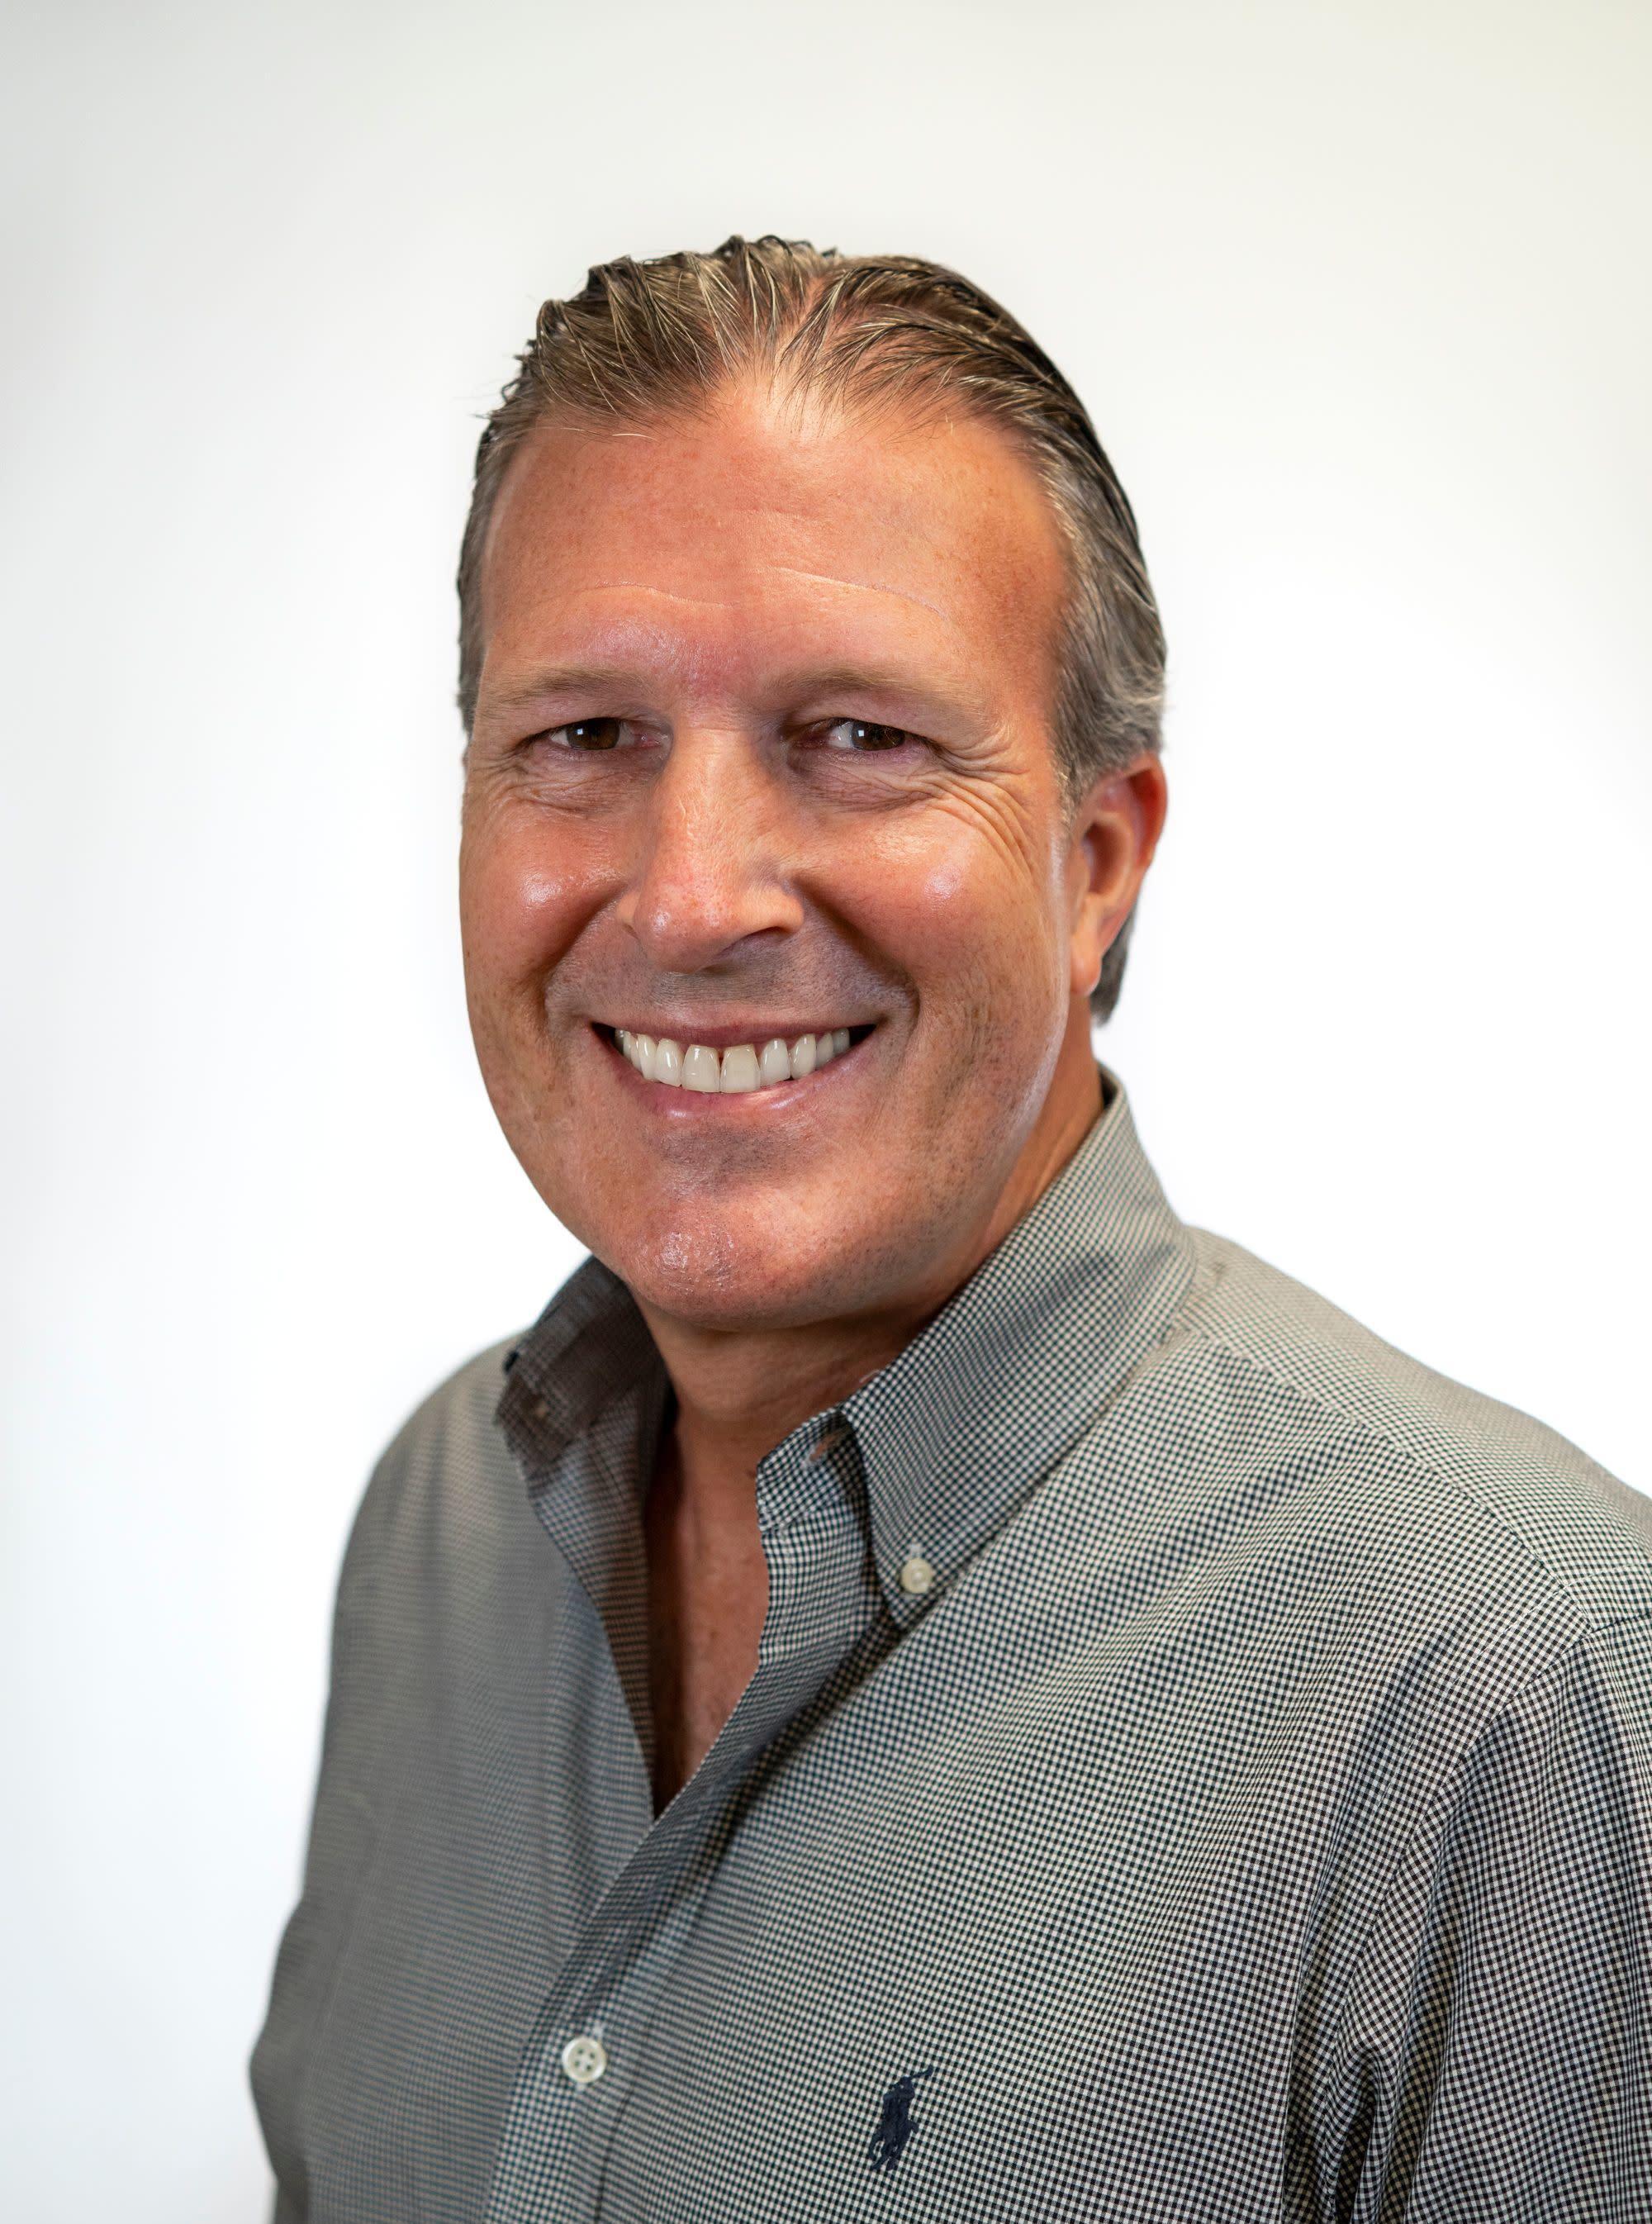 David Cavalier